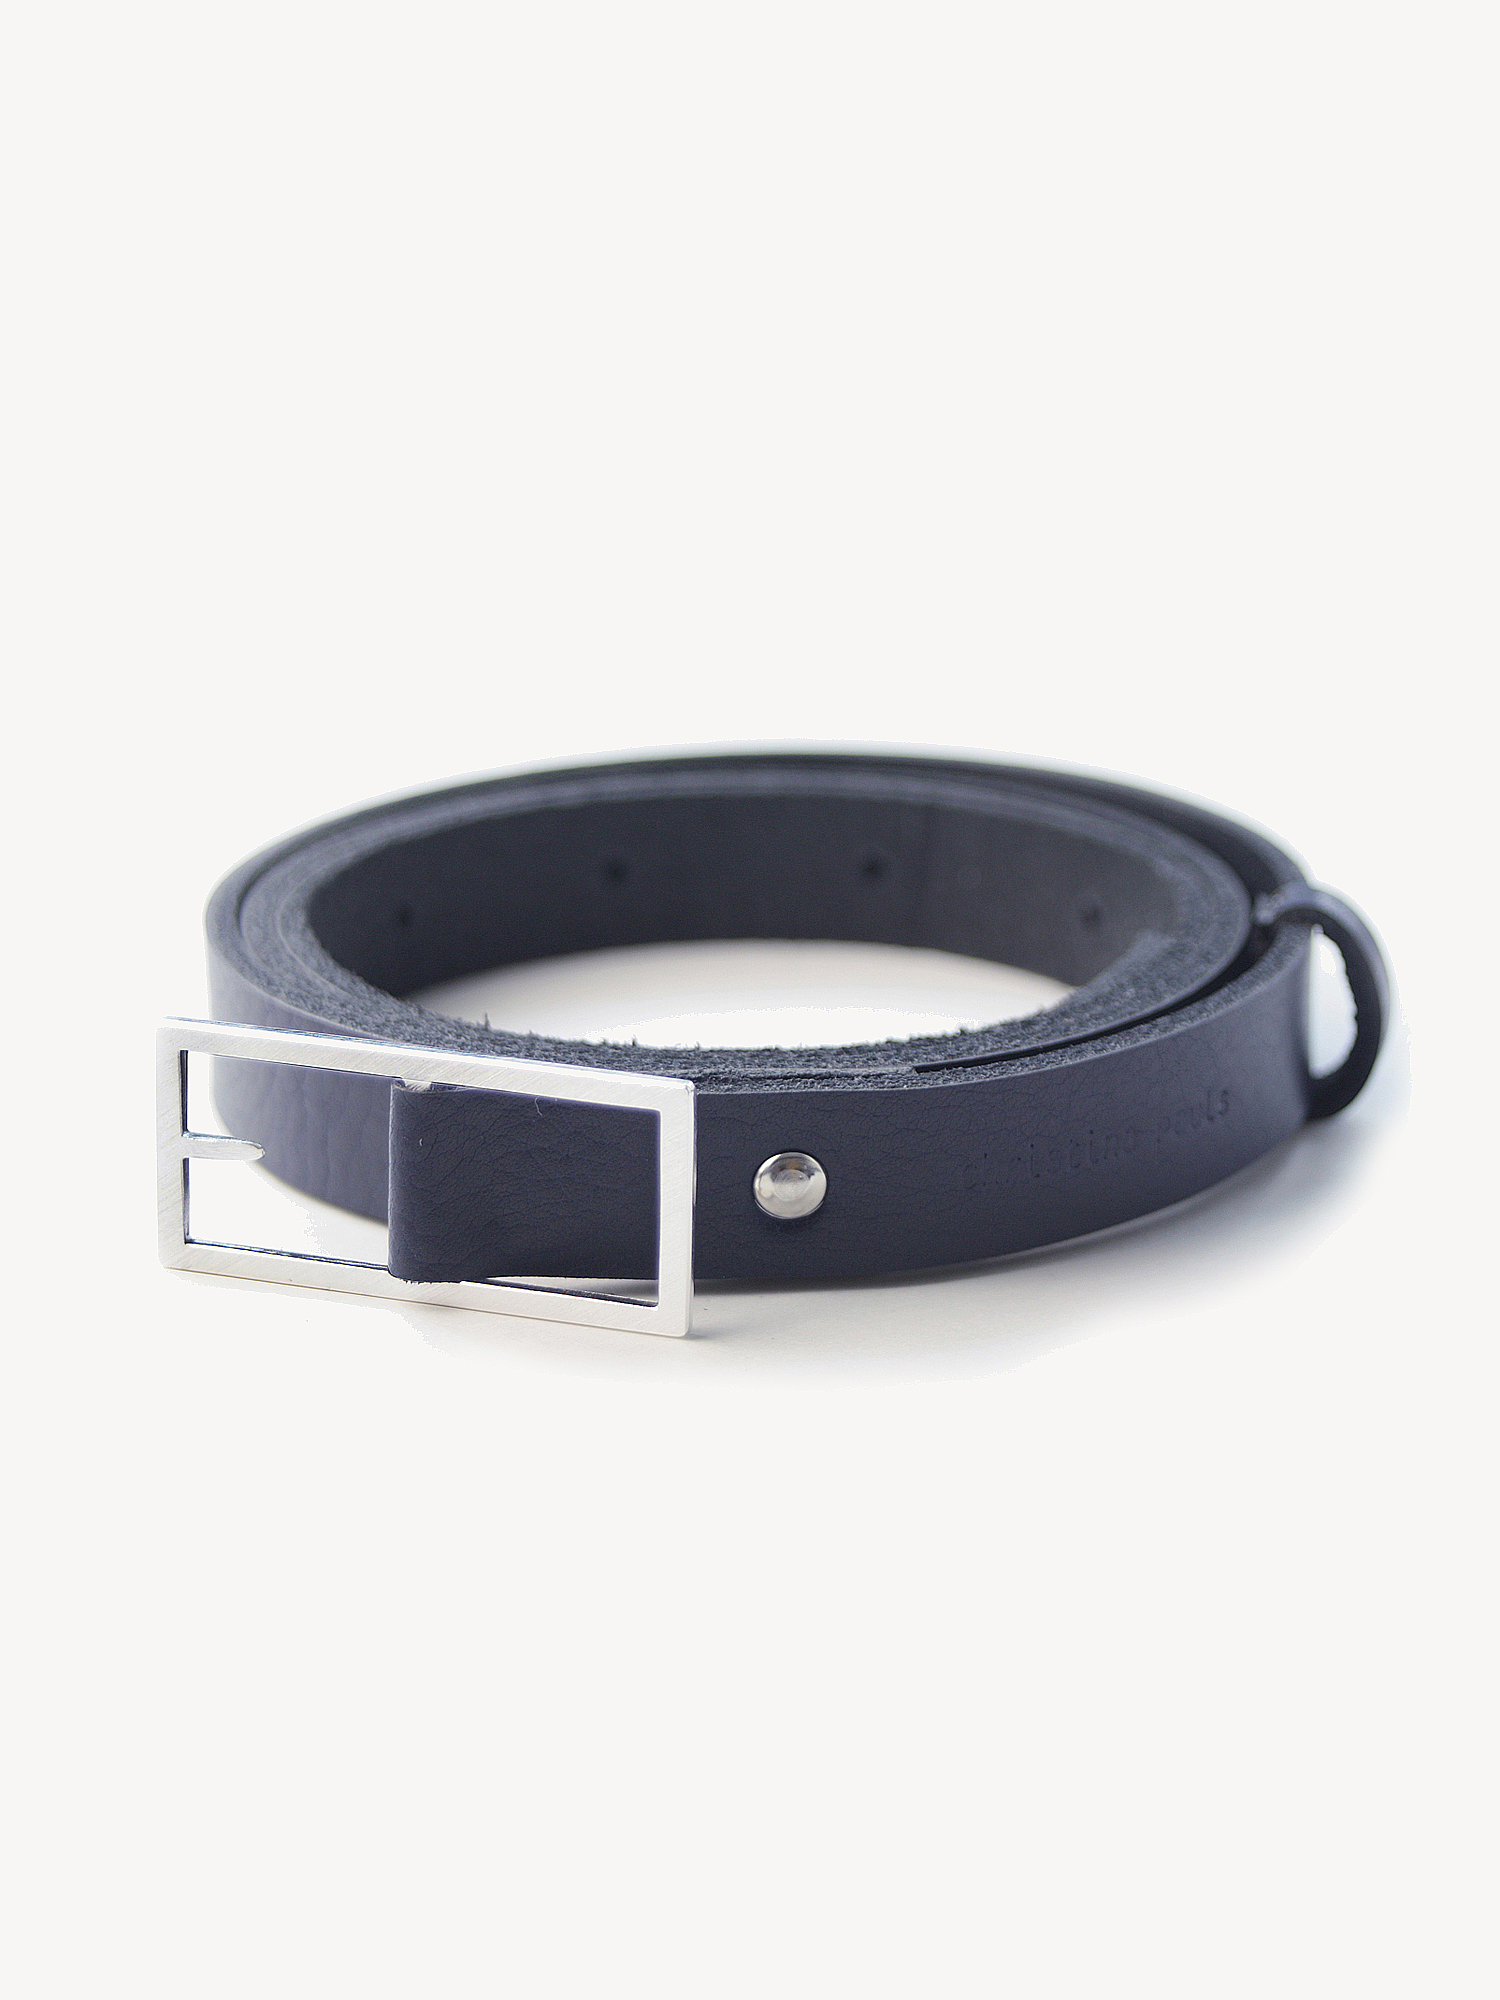 Leder-Gürtel, mittel in dunkelblau  Leather belt, medium in navy